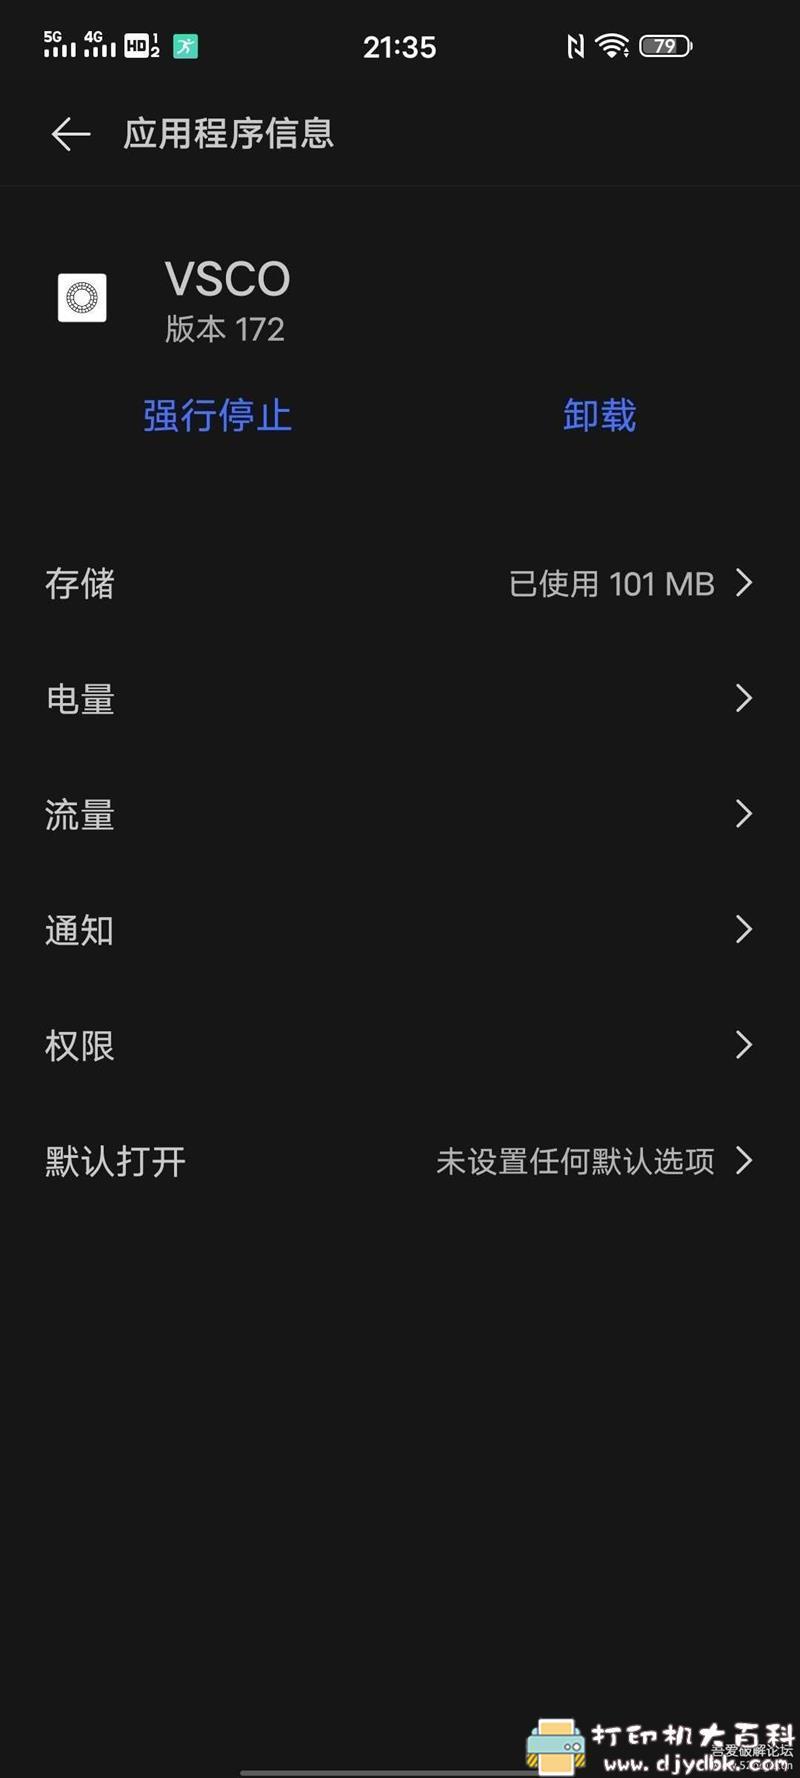 [Android]手机滤镜软件 VSCO 172版本 已解锁(2020.7.9 更新) 配图 No.1